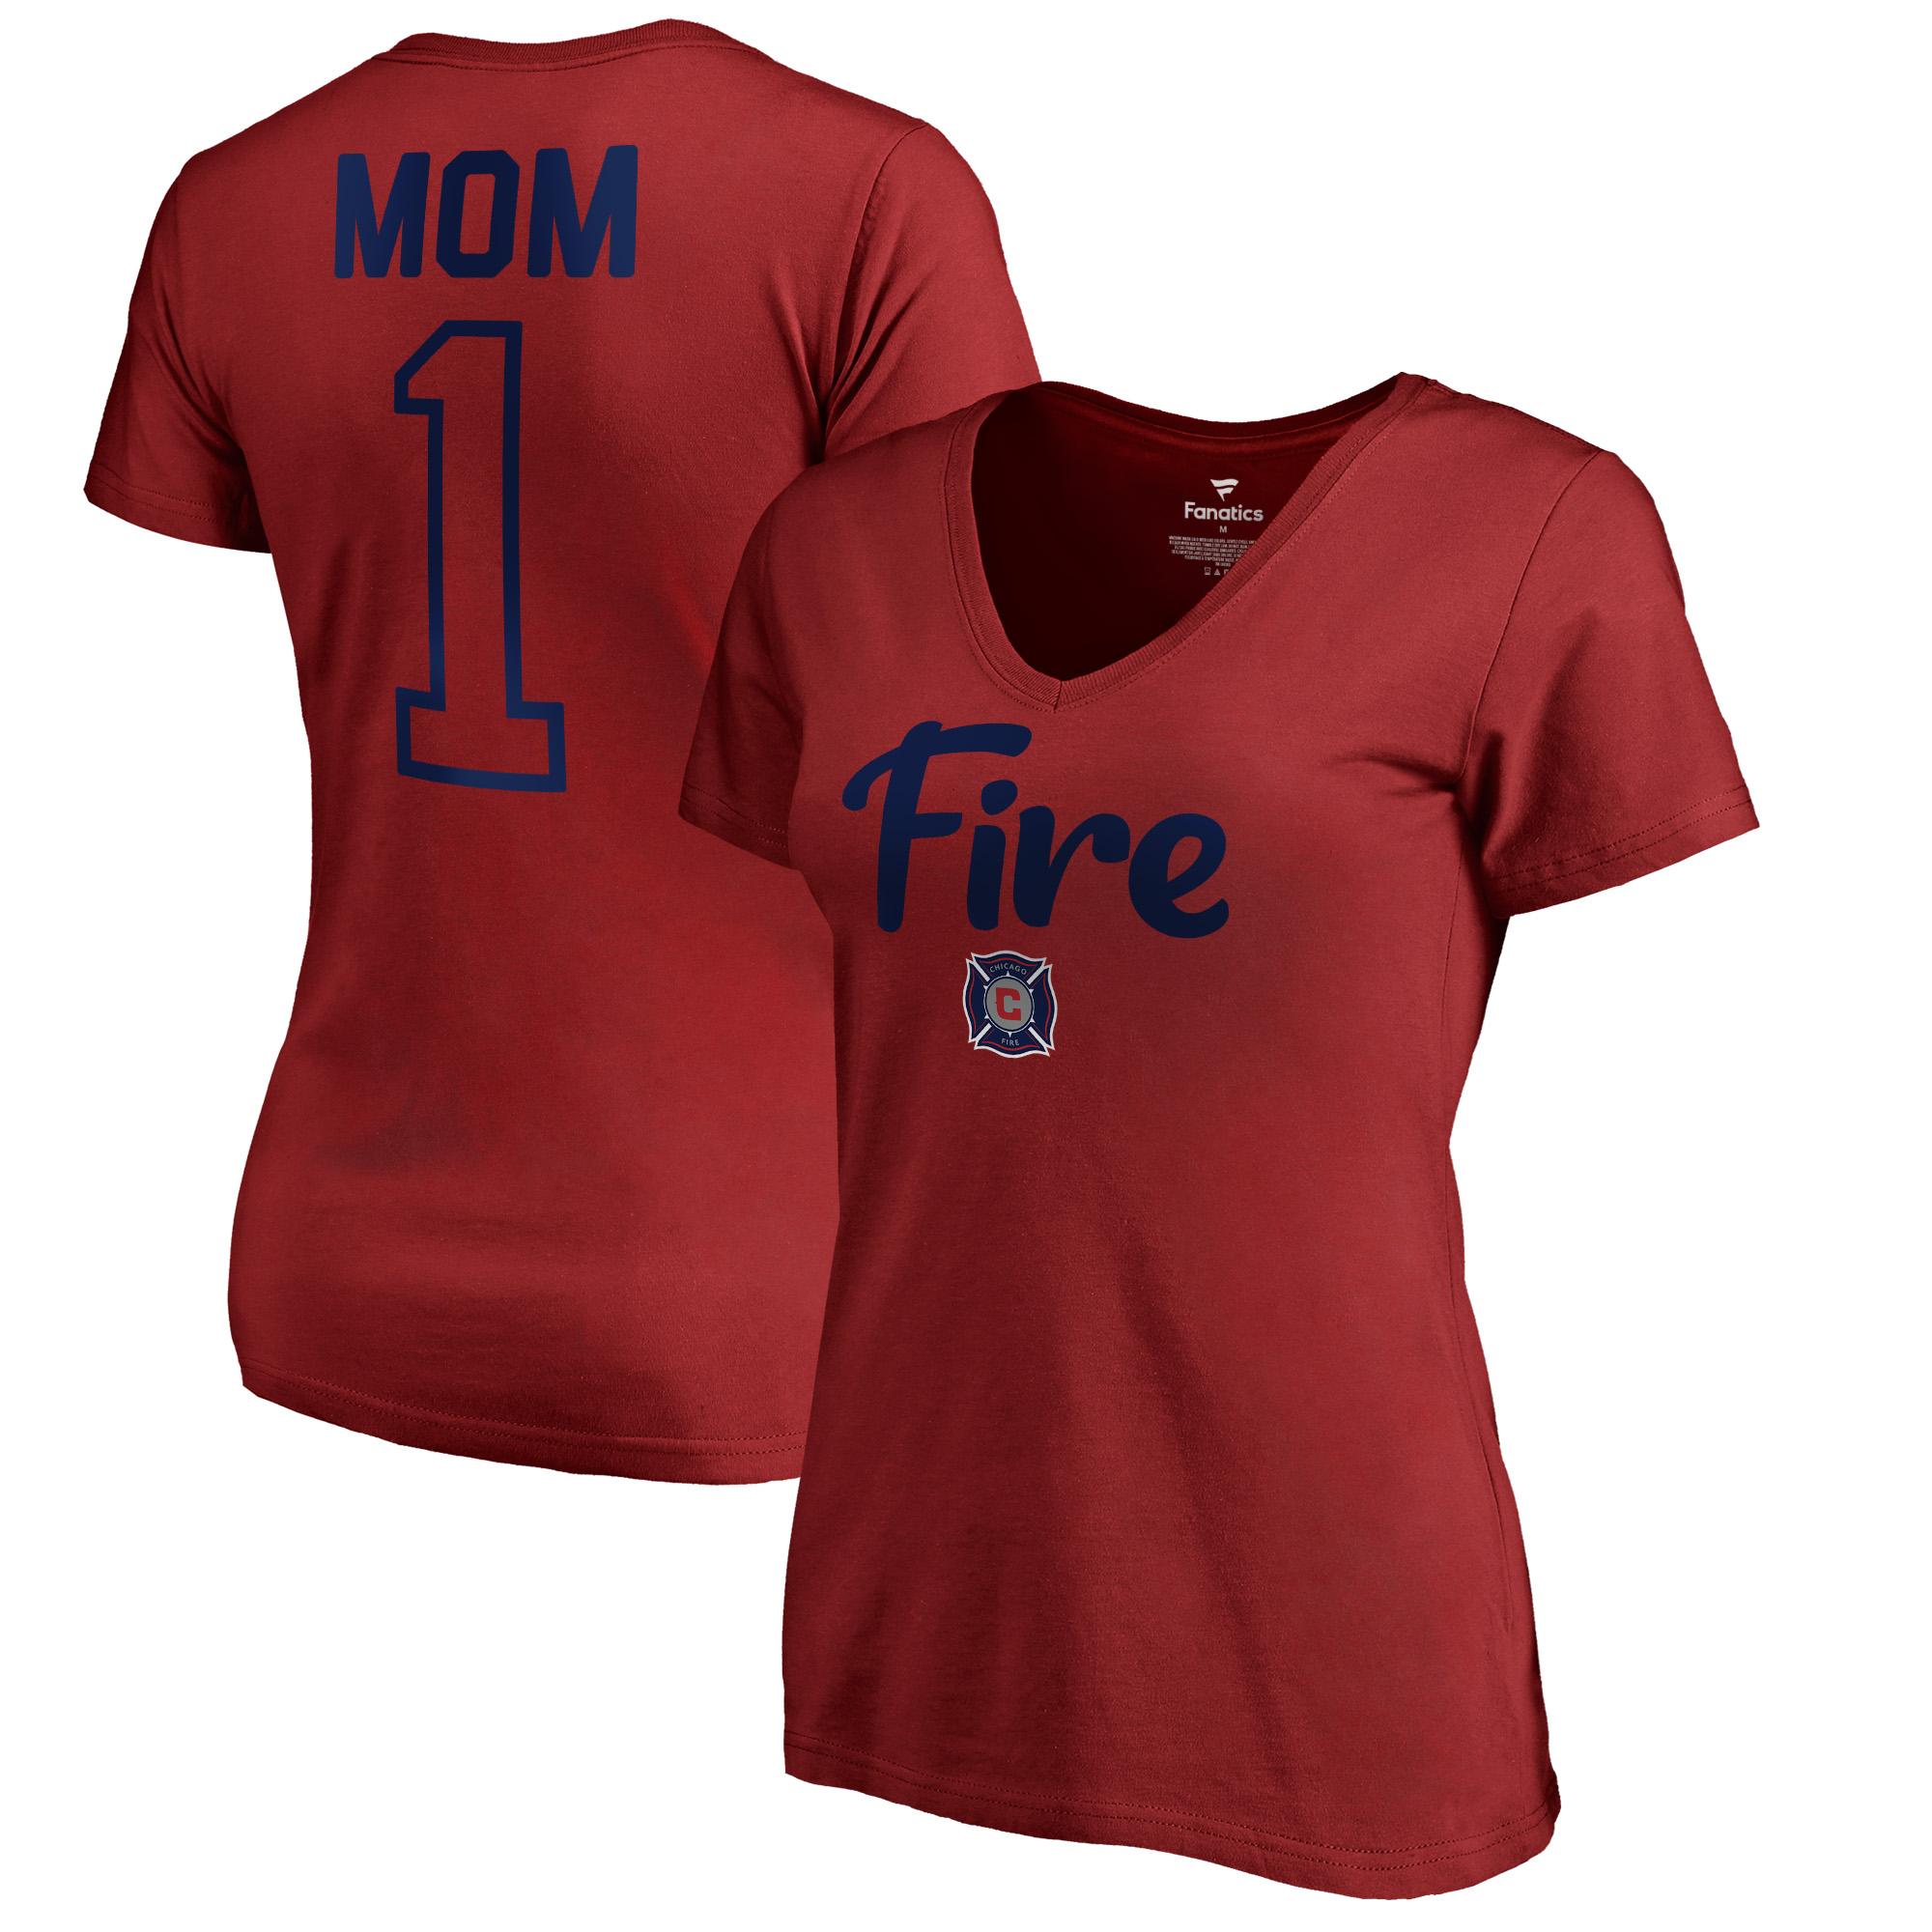 Chicago Fire Fanatics Branded Women's #1 Mom T-Shirt - Red